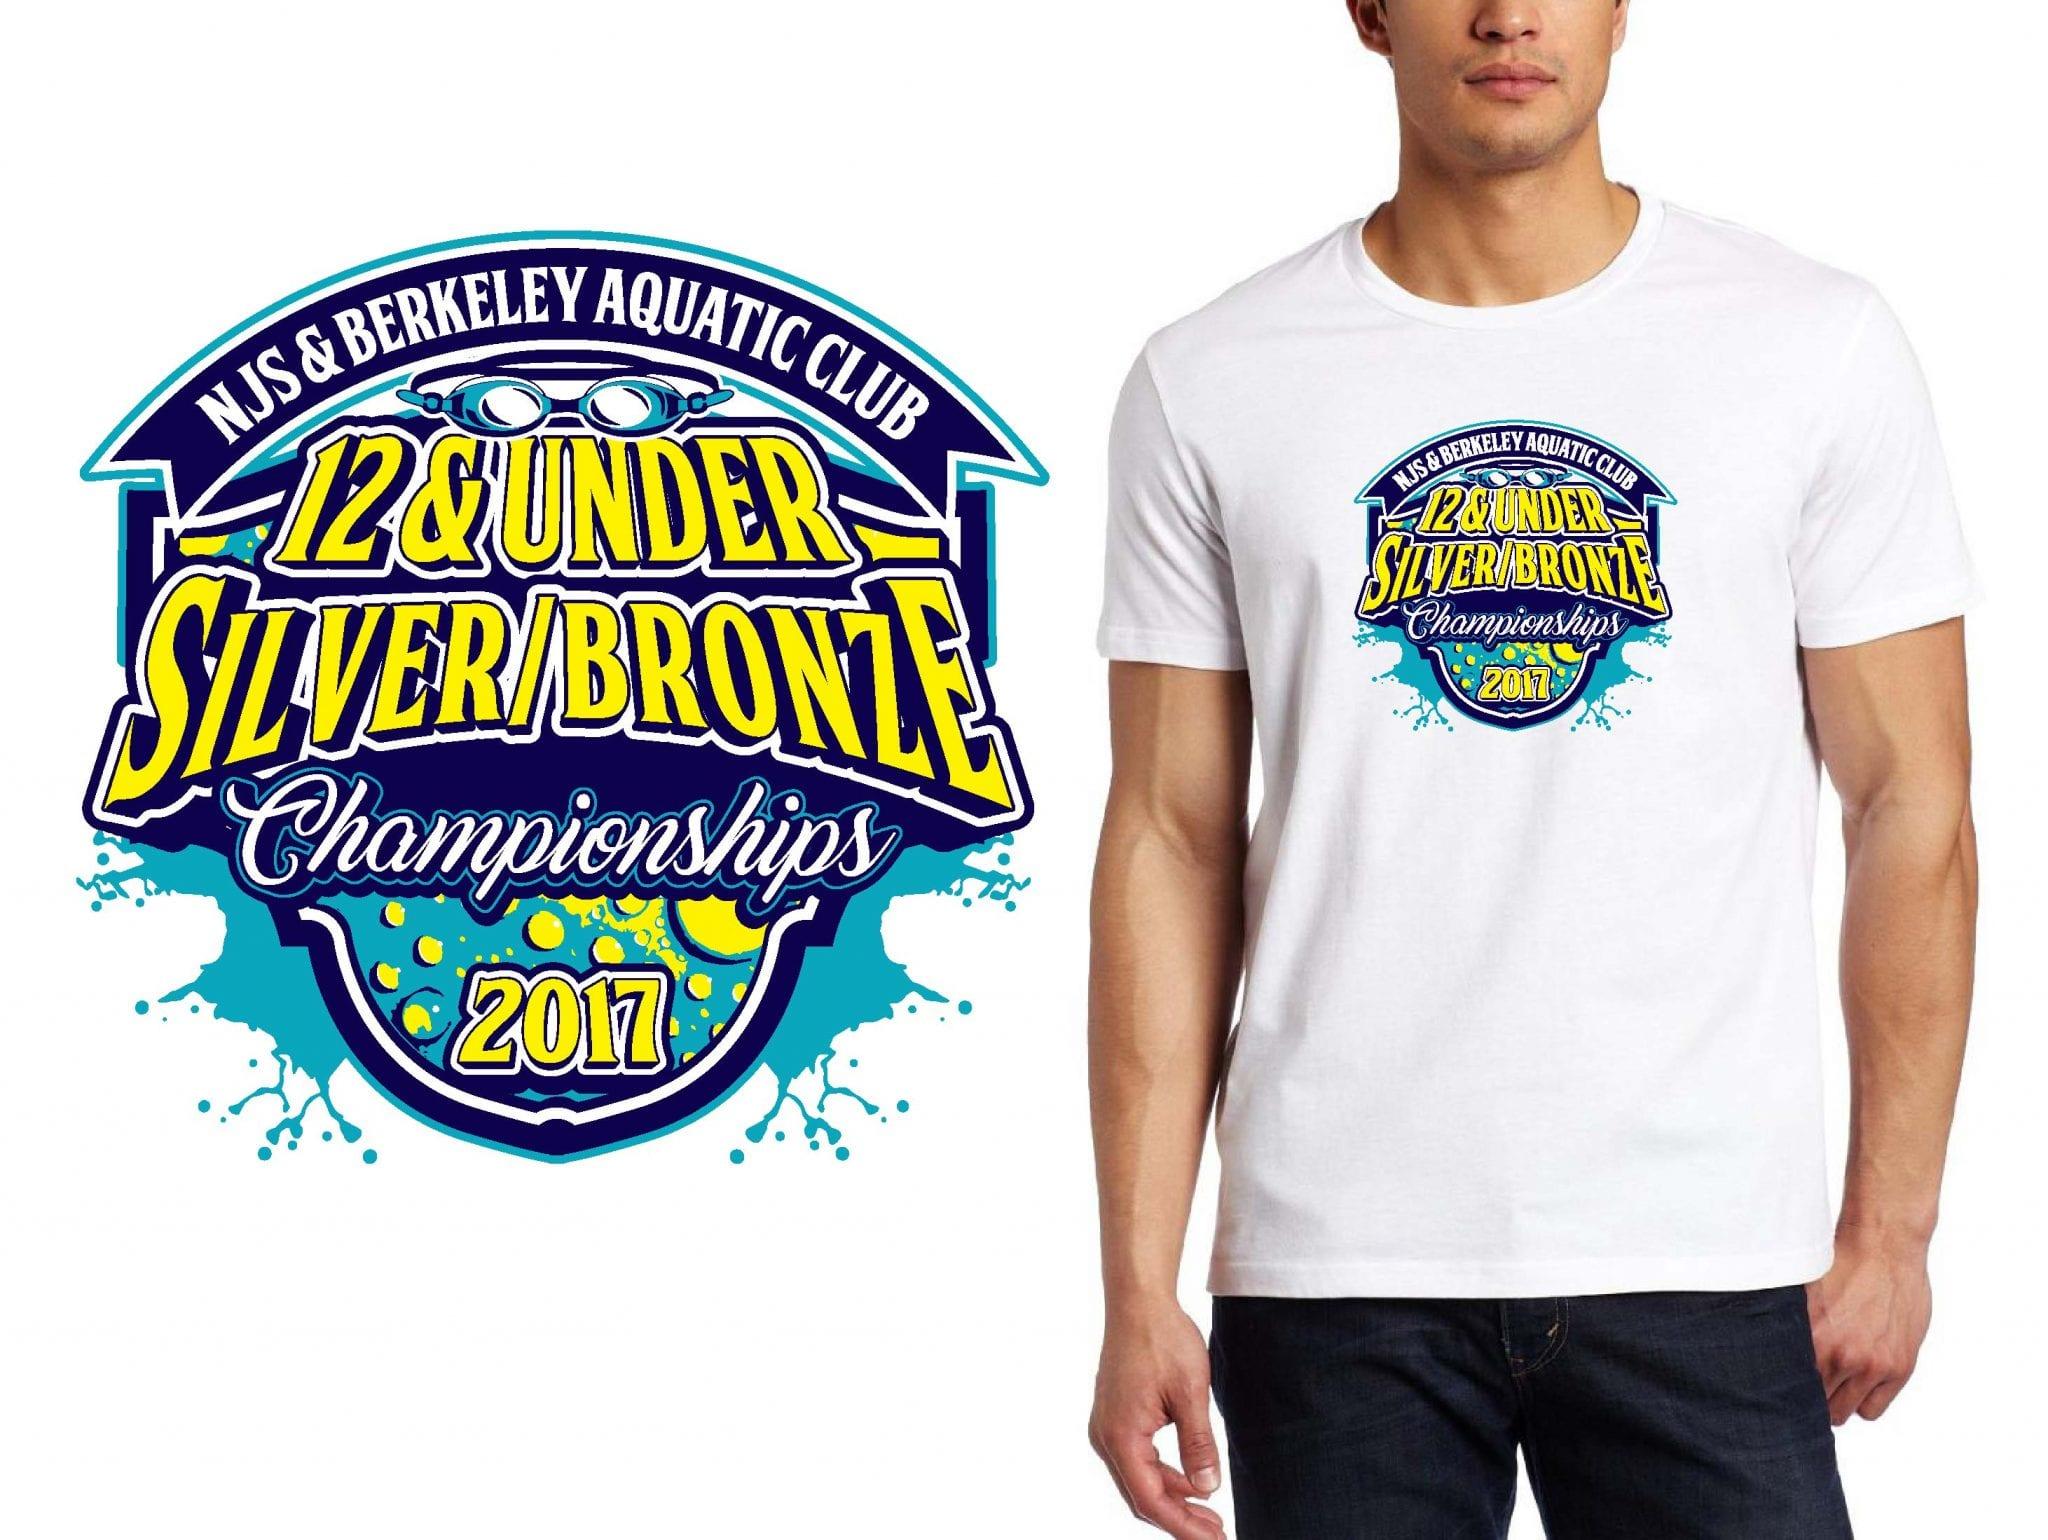 SWIMMING LOGO for NJS-Berkeley-Aquatic-Club-12-Under-Silver-Bronze-Championships T-SHIRT UrArtStudio